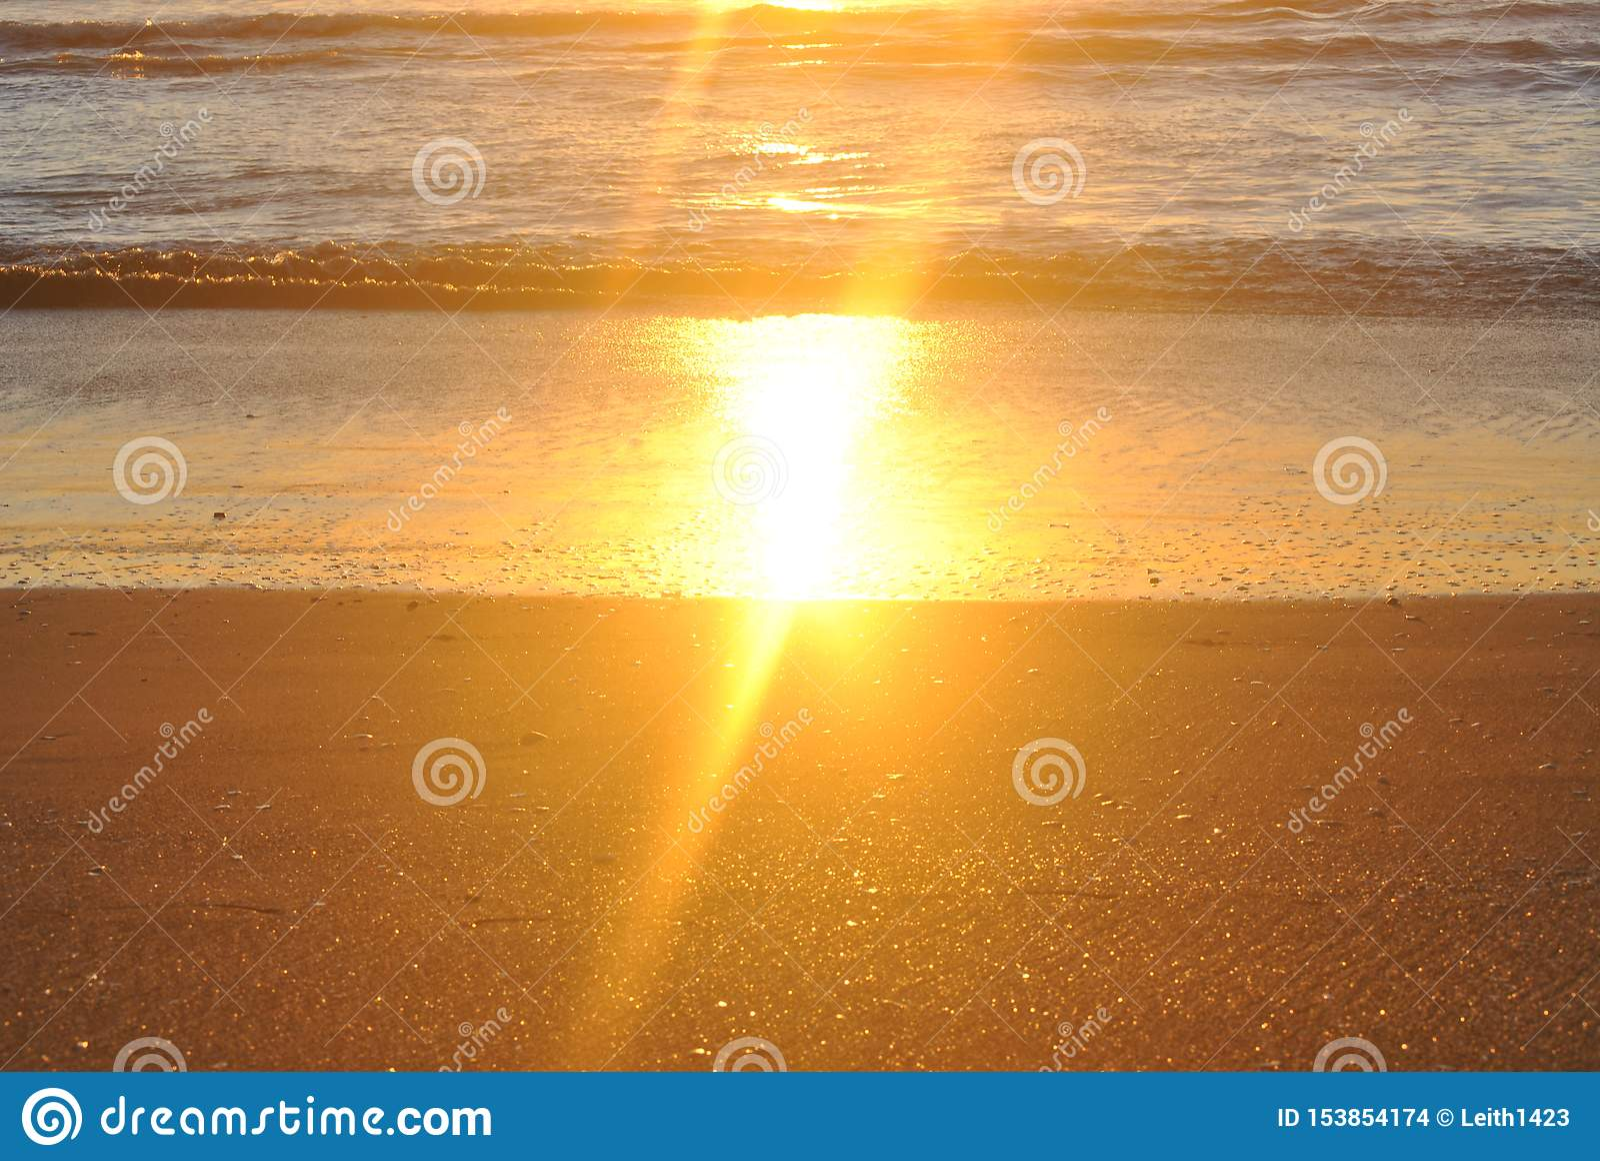 Sol de oro que refleja de la arena mojada